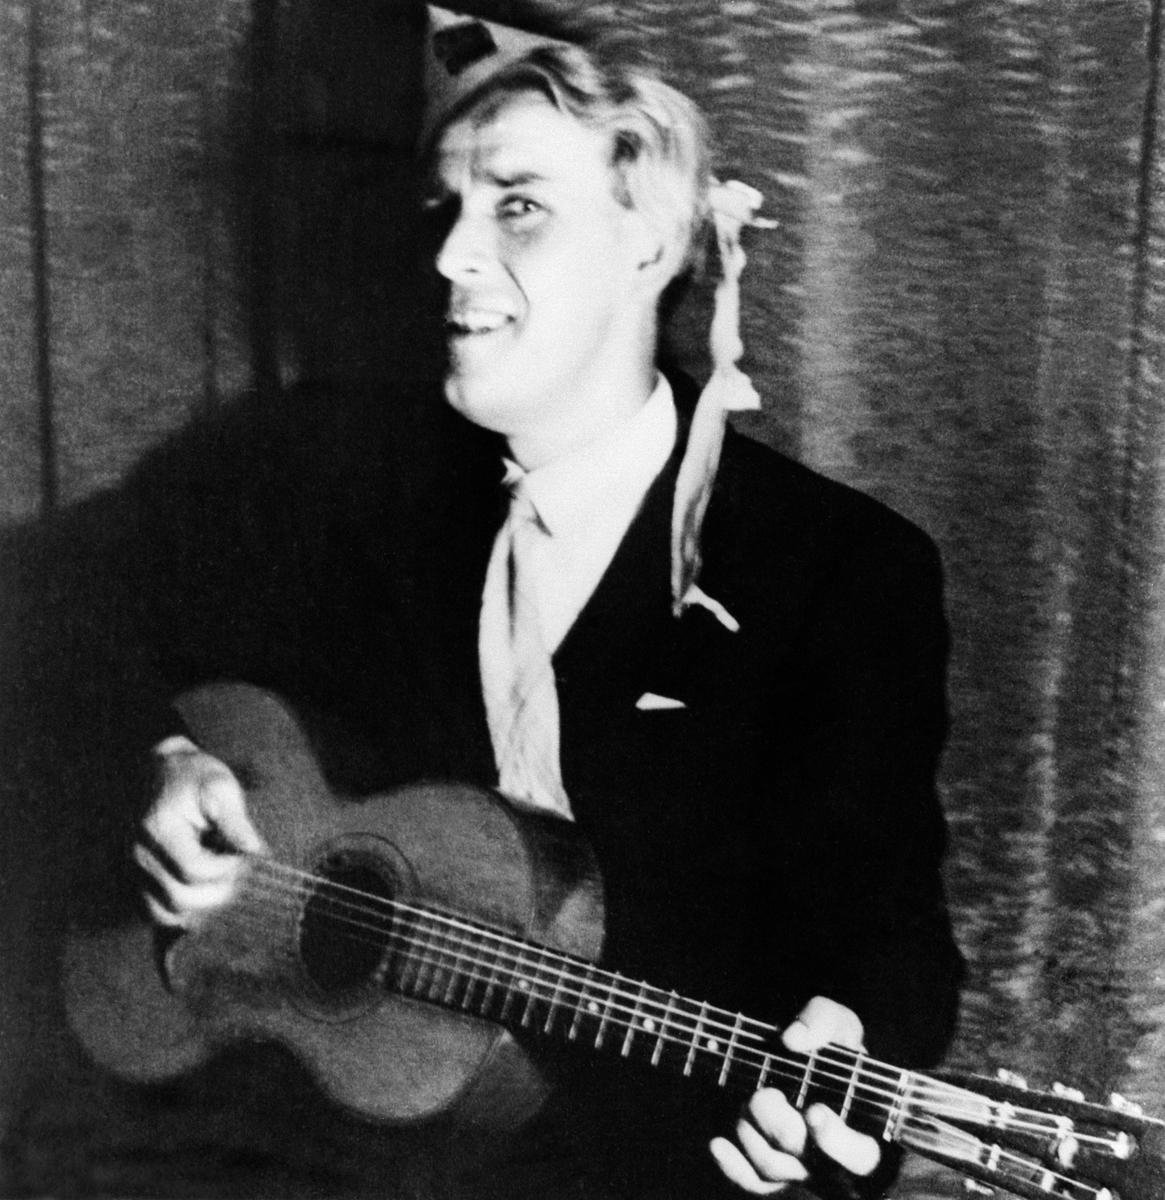 Alf Prøysen med gitar, karnevalshatt, fra revy på Sem i Asker under krigen.